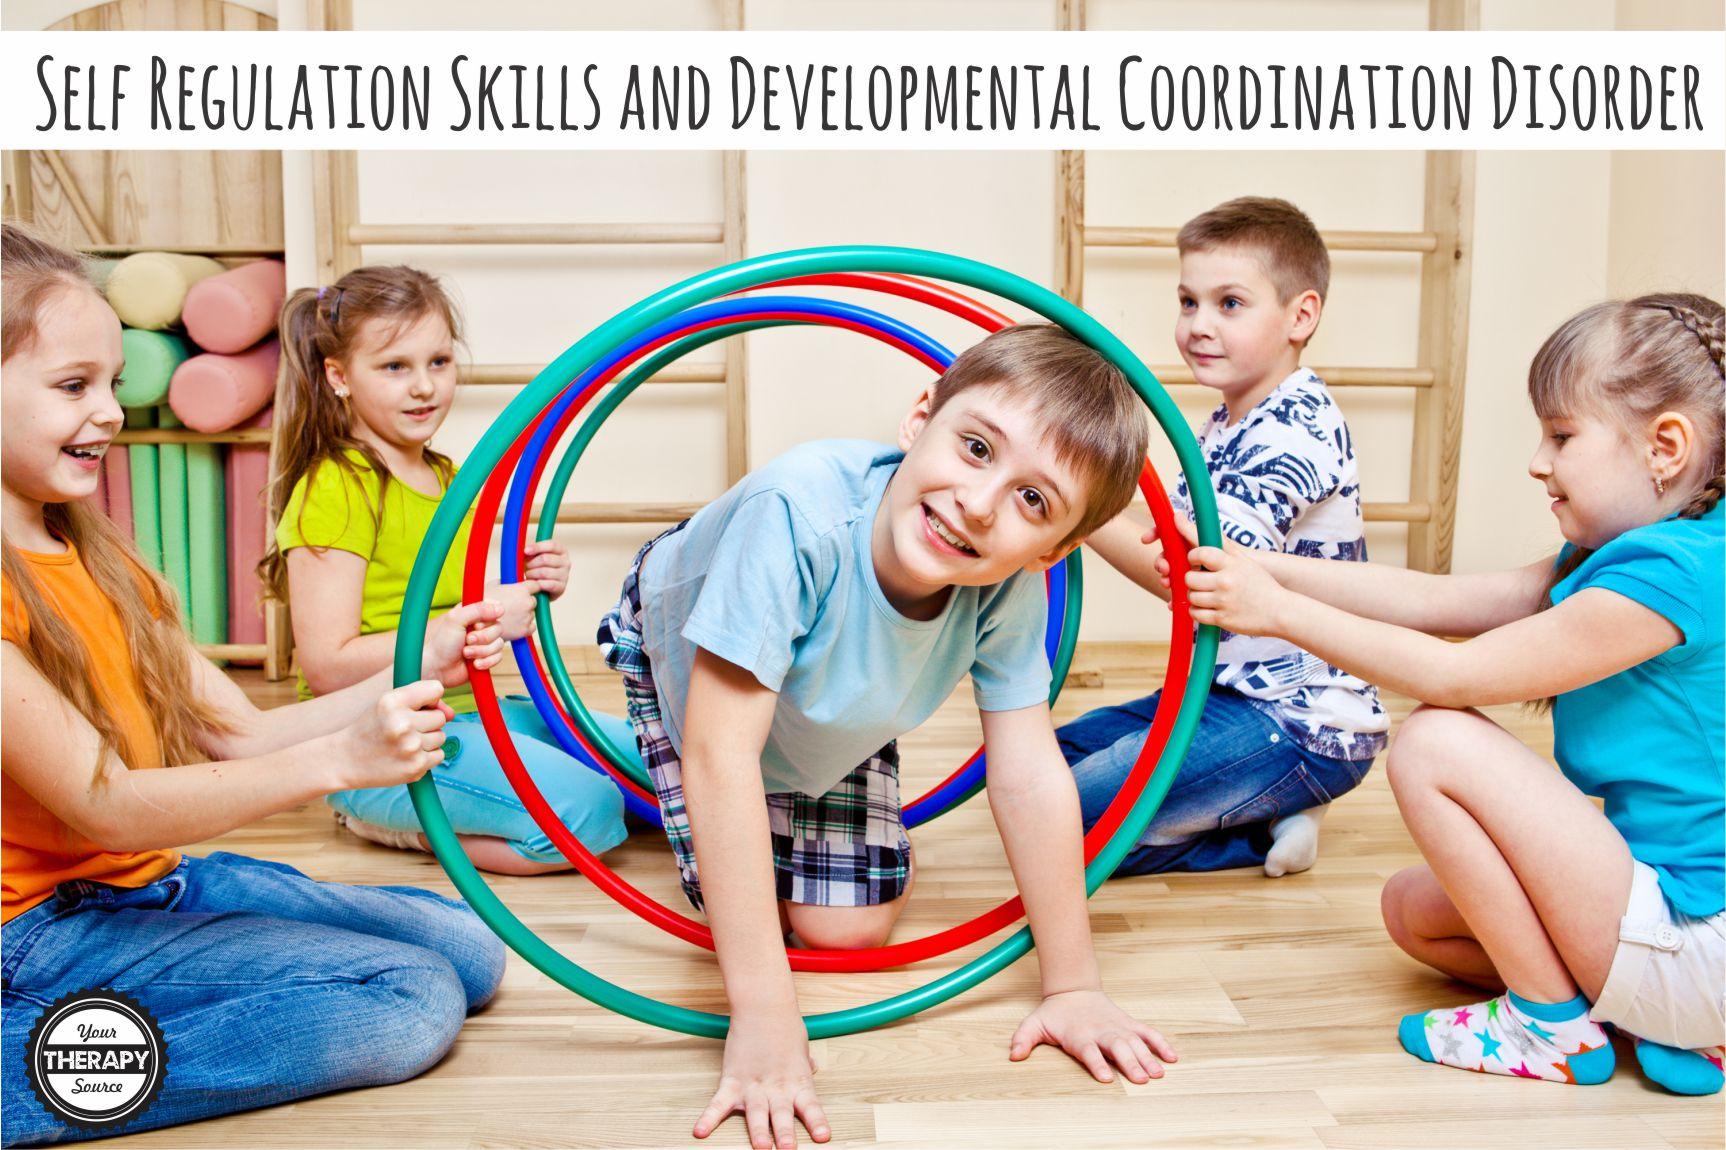 self regulation skills and developmental coordination